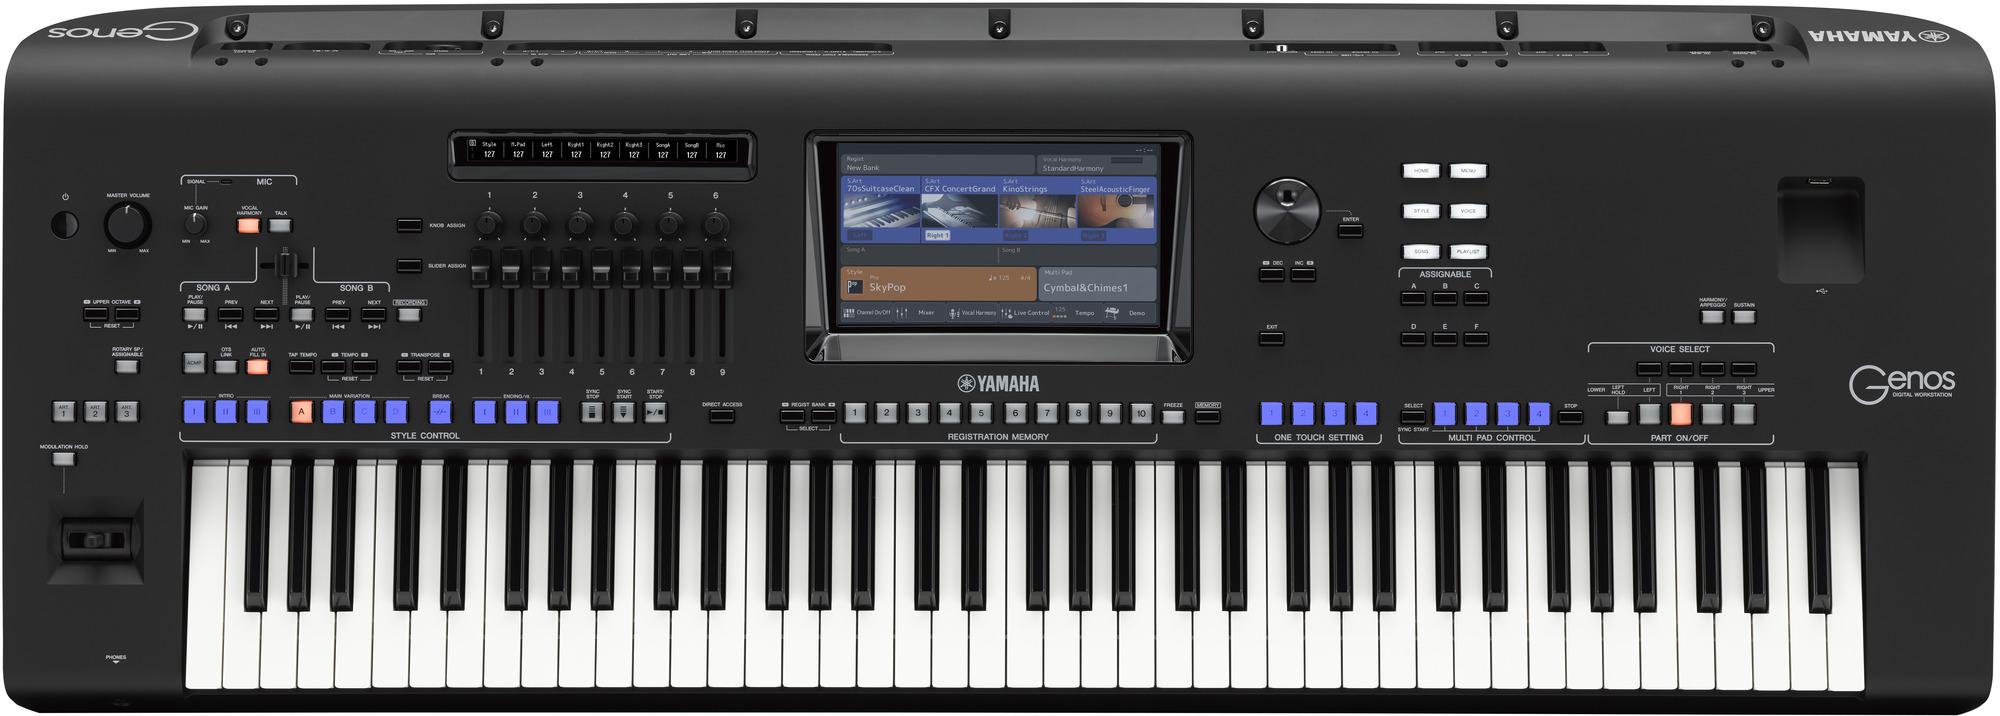 Yamaha-Genos-76-keys.jpg